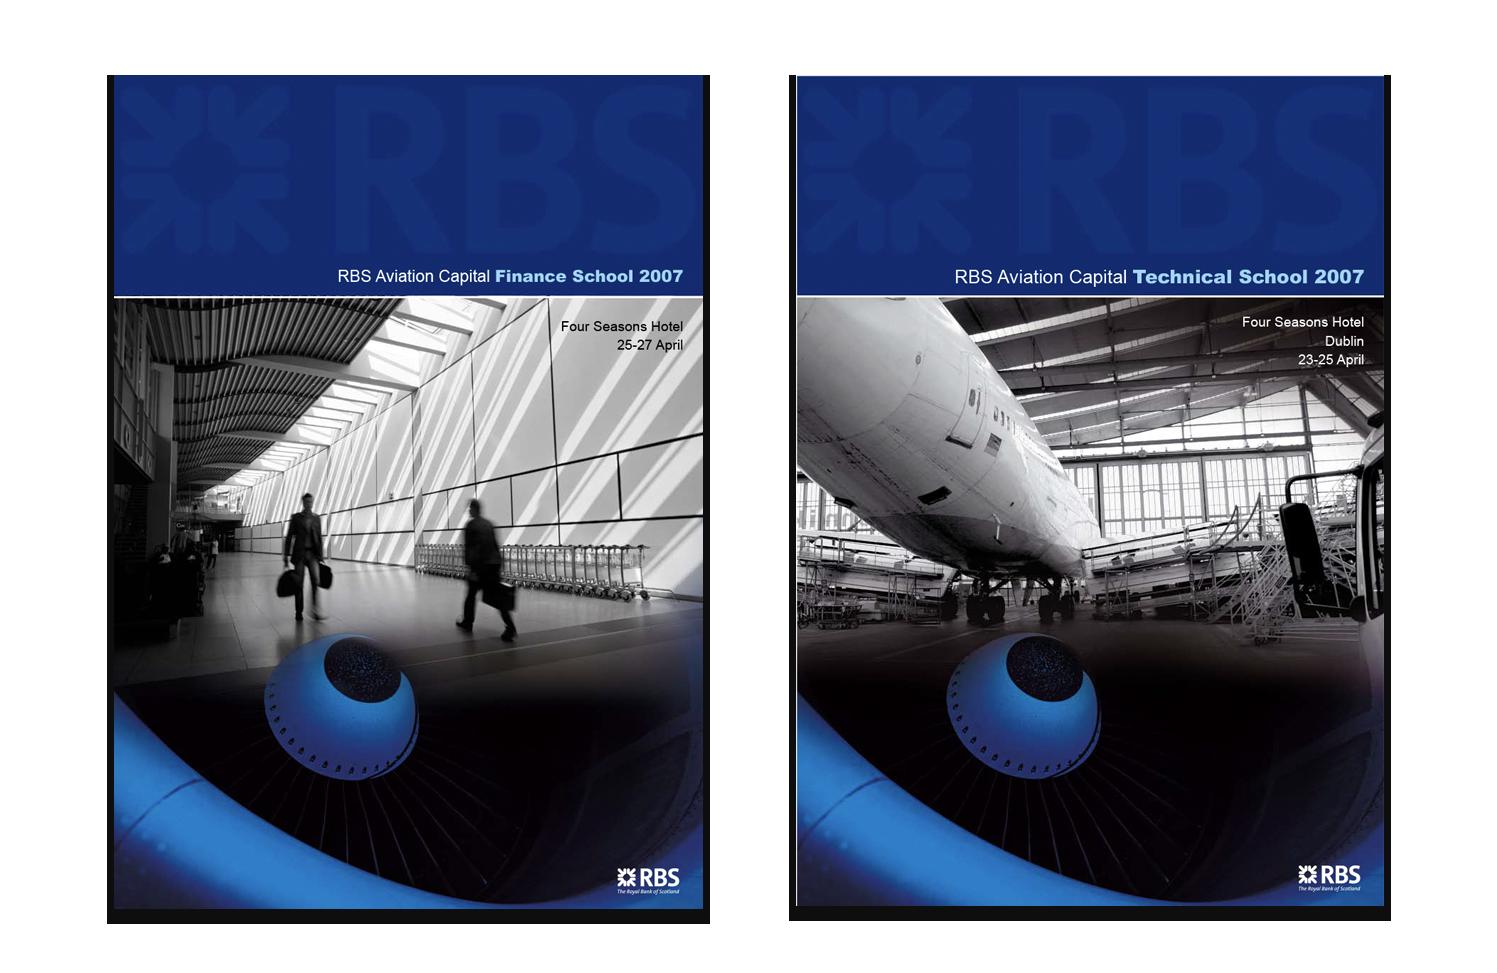 c_rbs_aviation_ads_travel_a4_design